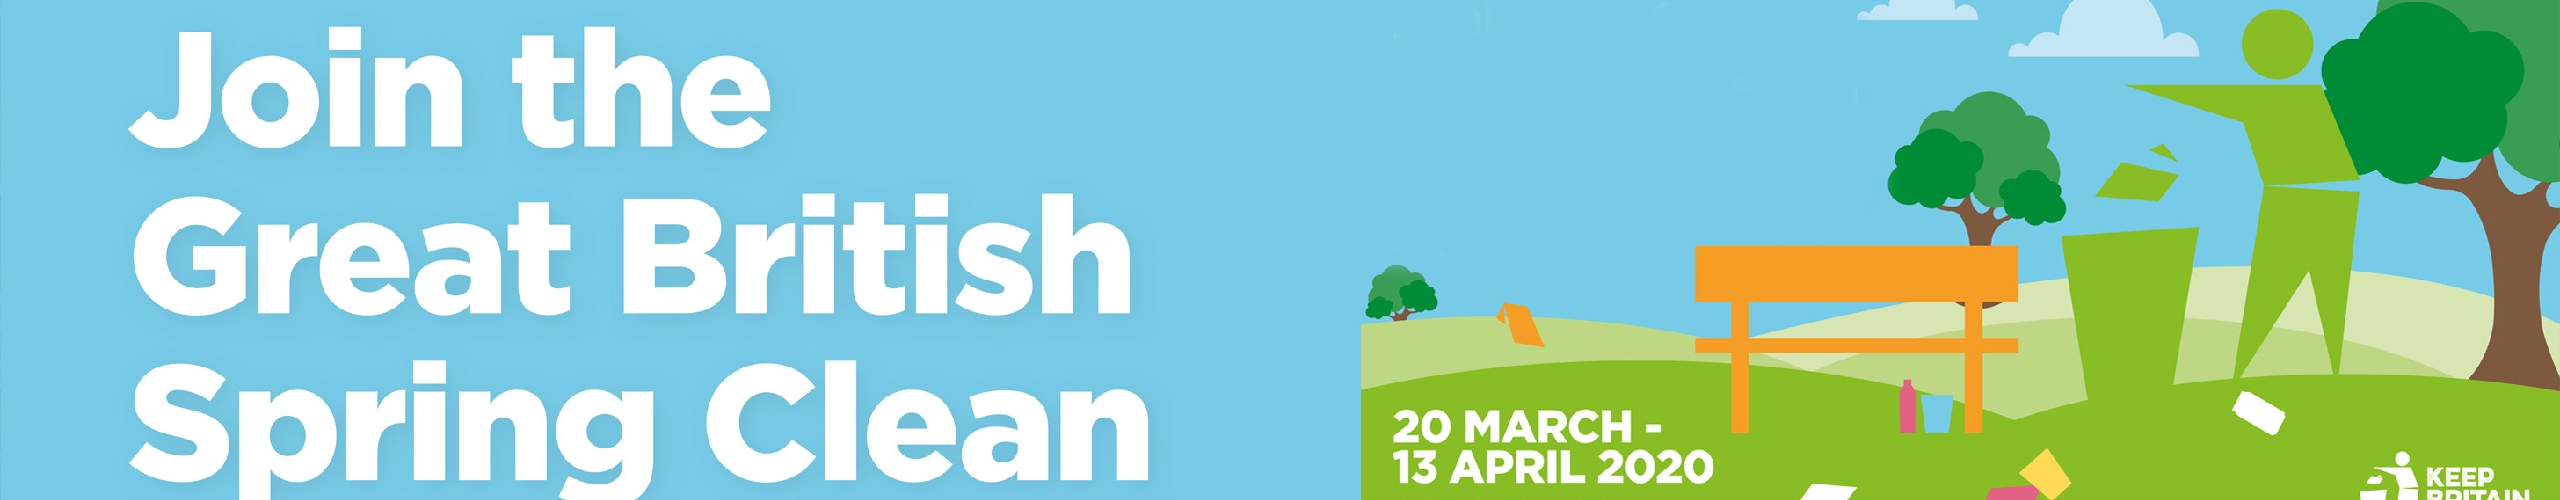 Great British SC 2020 web banner